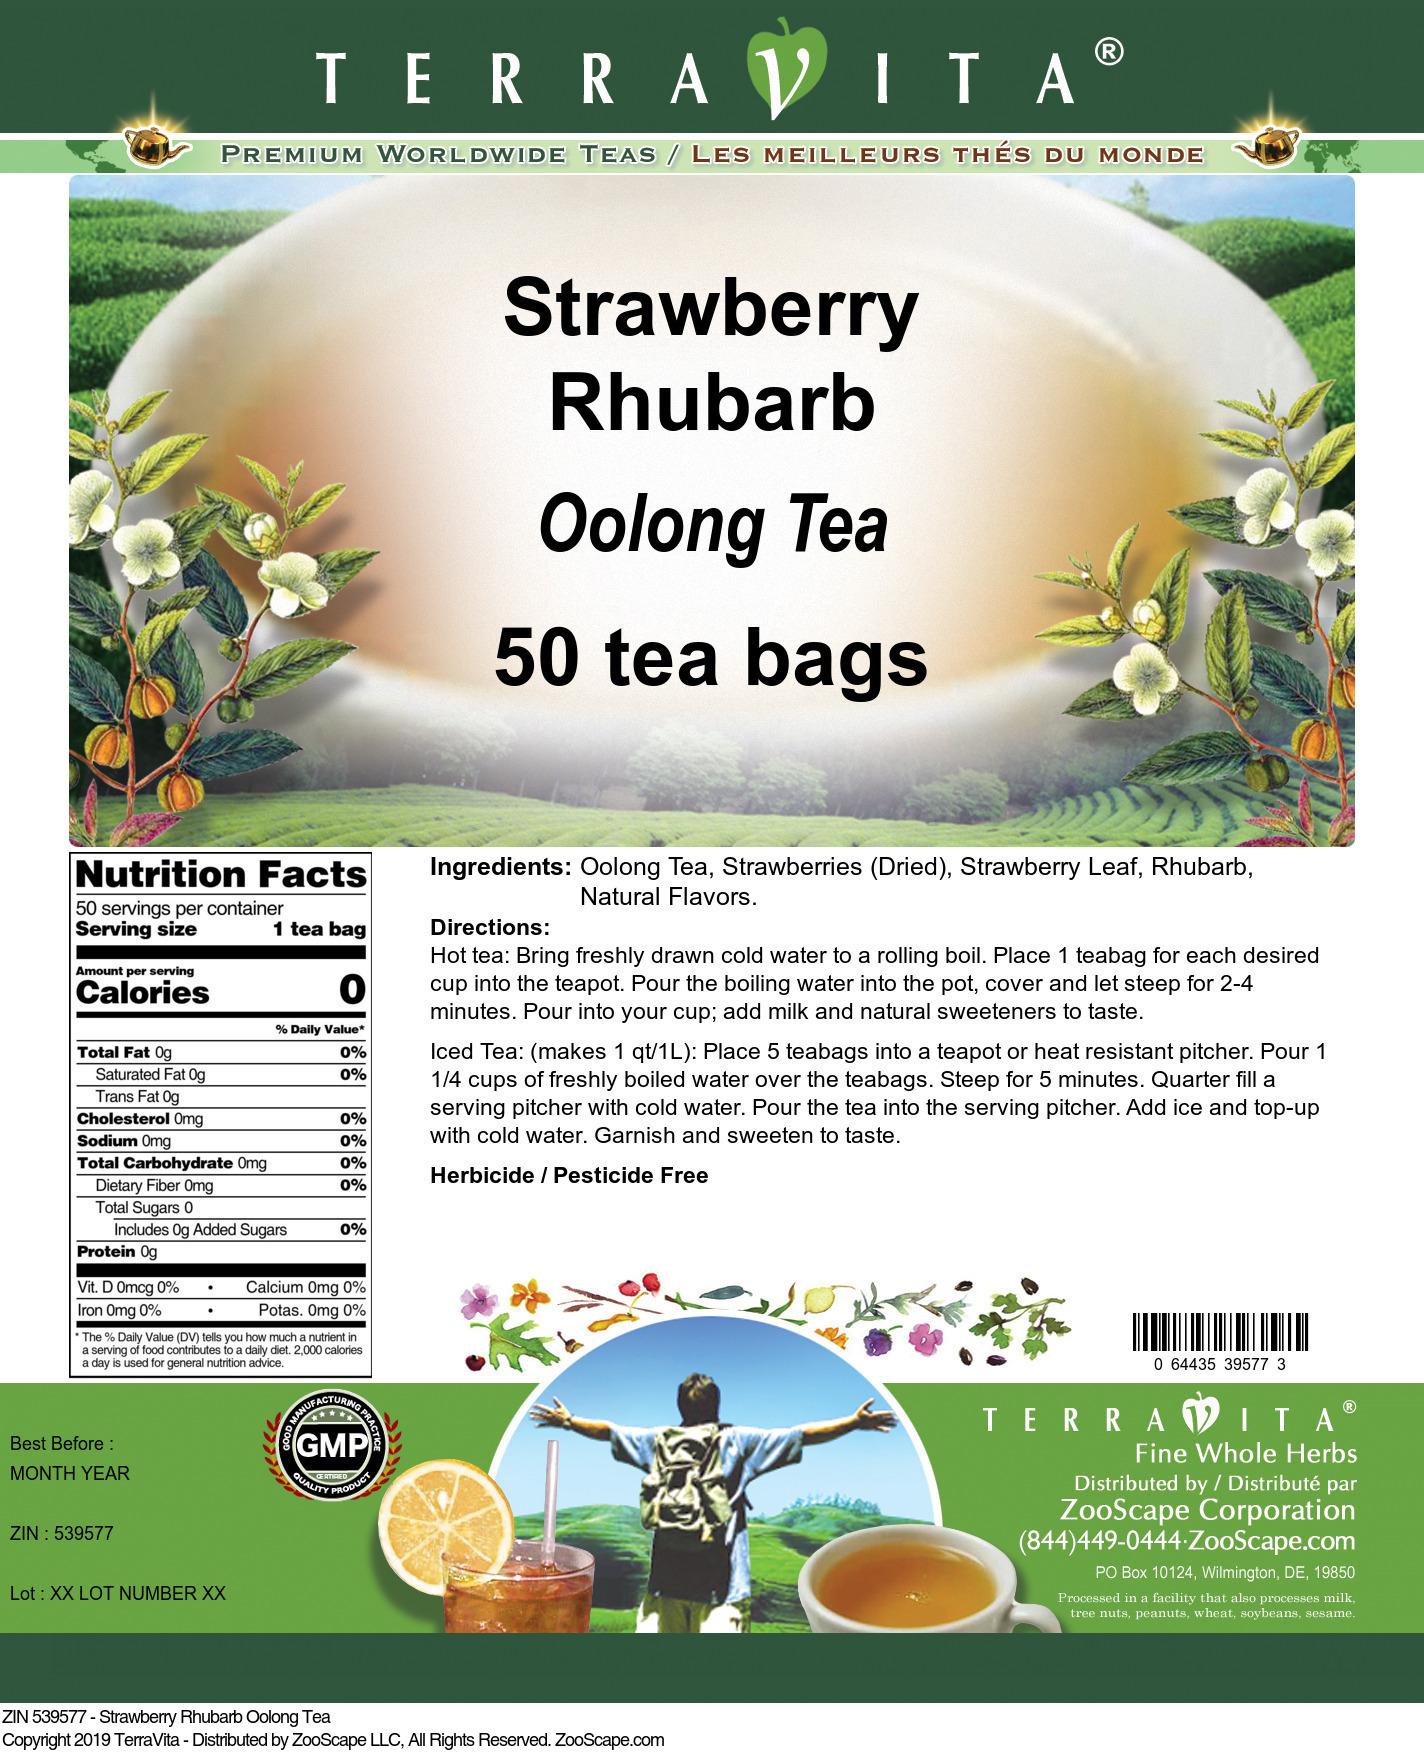 Strawberry Rhubarb Oolong Tea